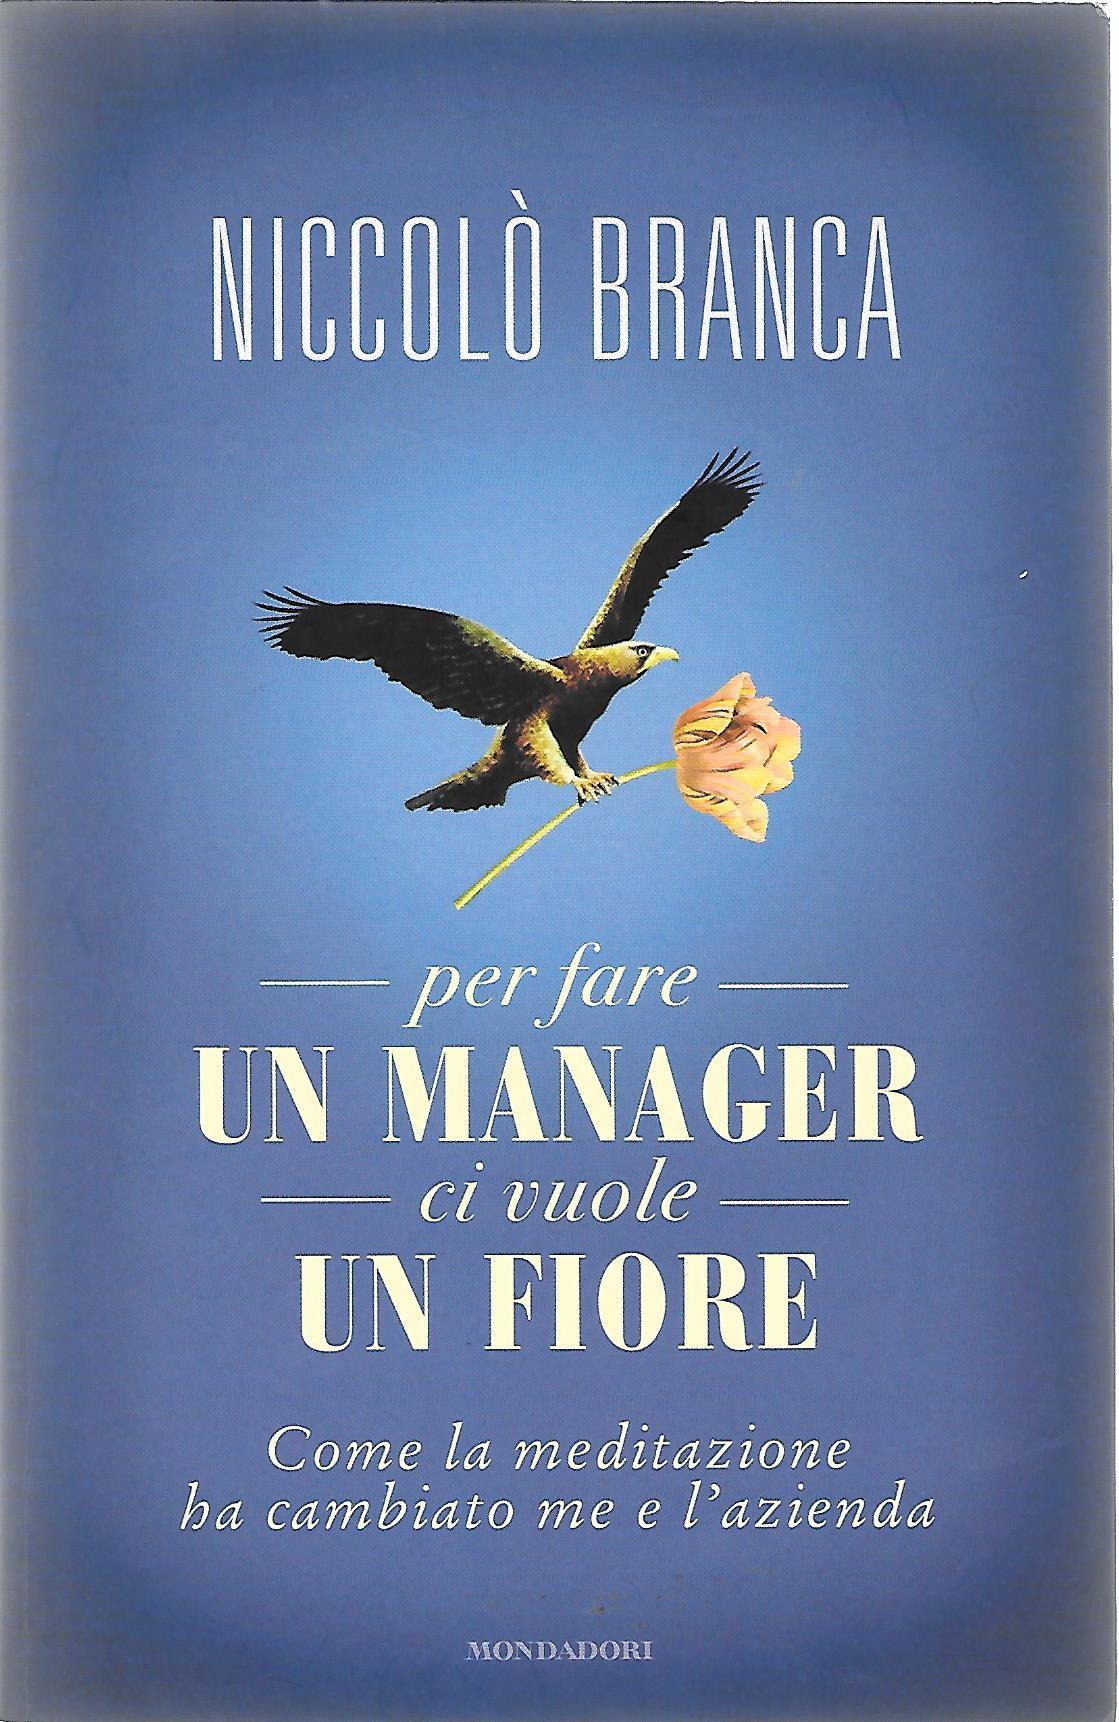 Niccolò Branca - Meditazione per manager